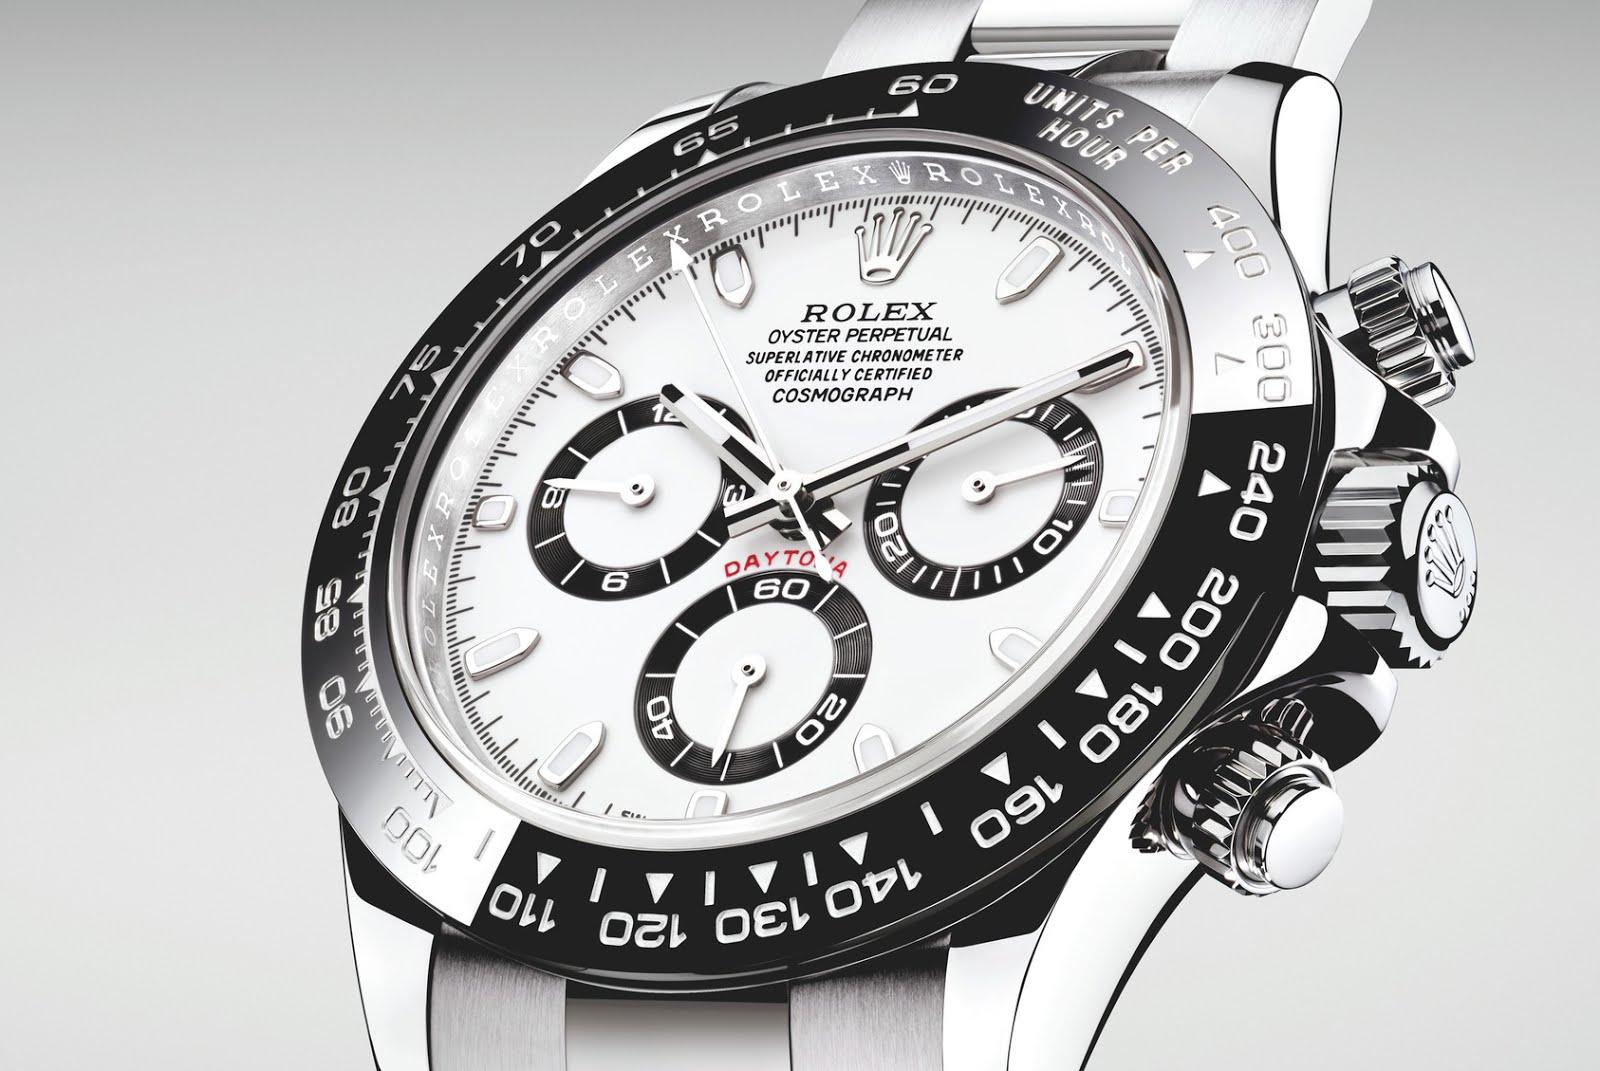 761b943bd78 2016 Rolex Cosmograph Daytona 116500 LN (foto  Rolex)